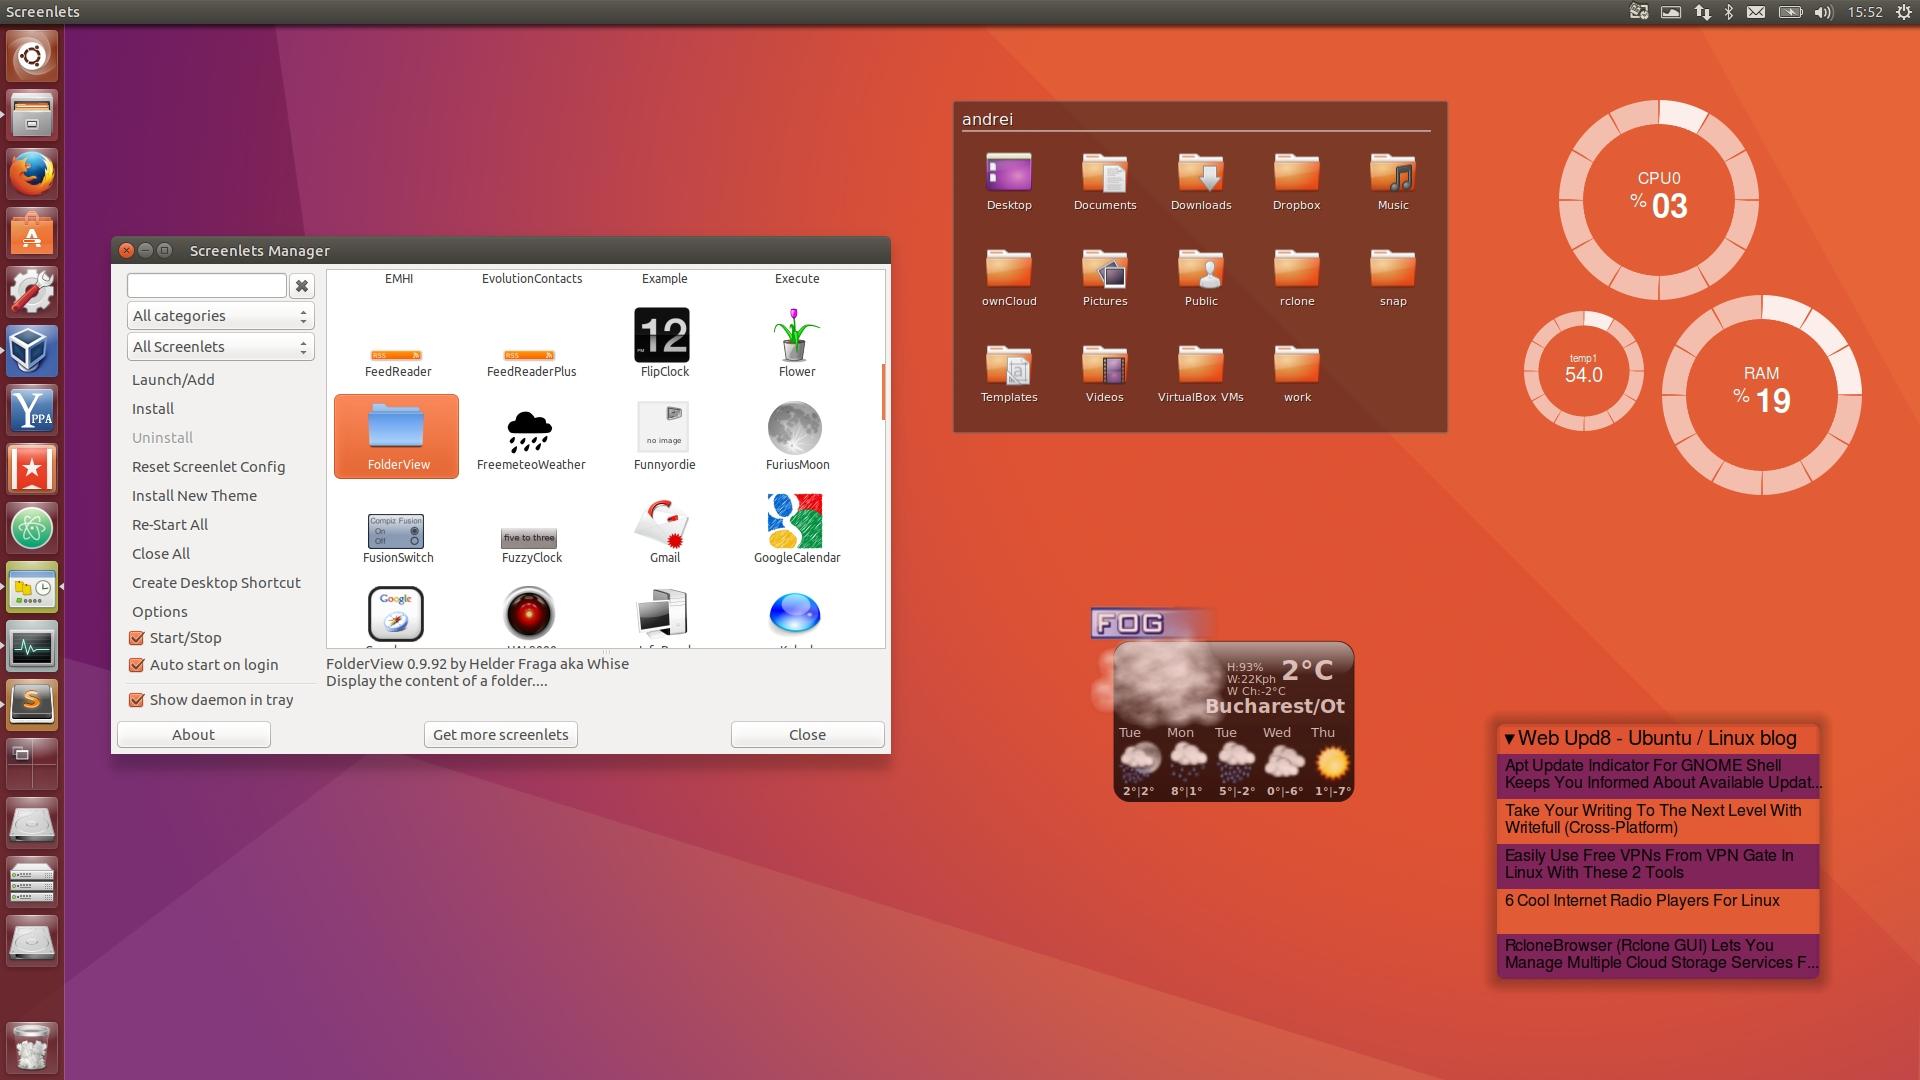 Screenlets (Desktop Widgets) Fixed For Ubuntu 16.04, Available In_Countdown Calendar For Computer Desktop